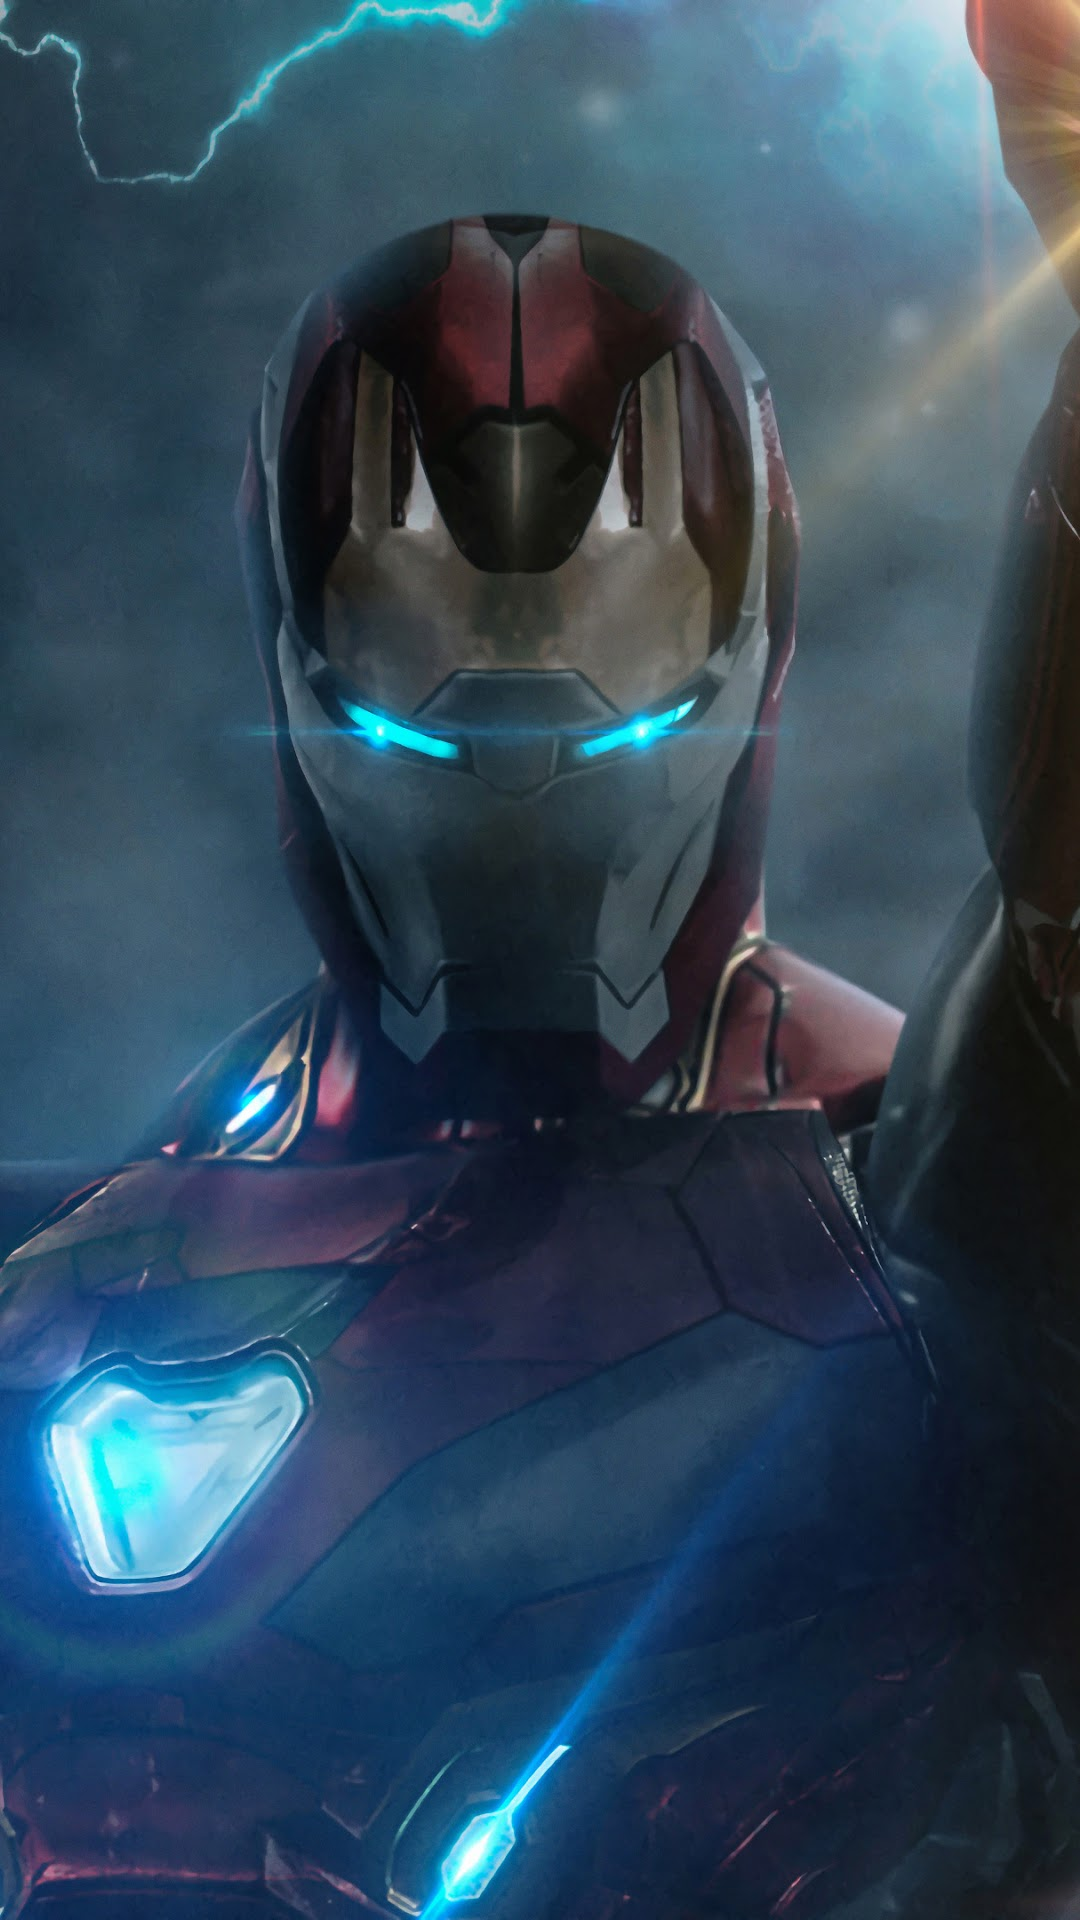 Iron Man, Infinity Stones, Avengers - Iphone 11 Pro Max - HD Wallpaper